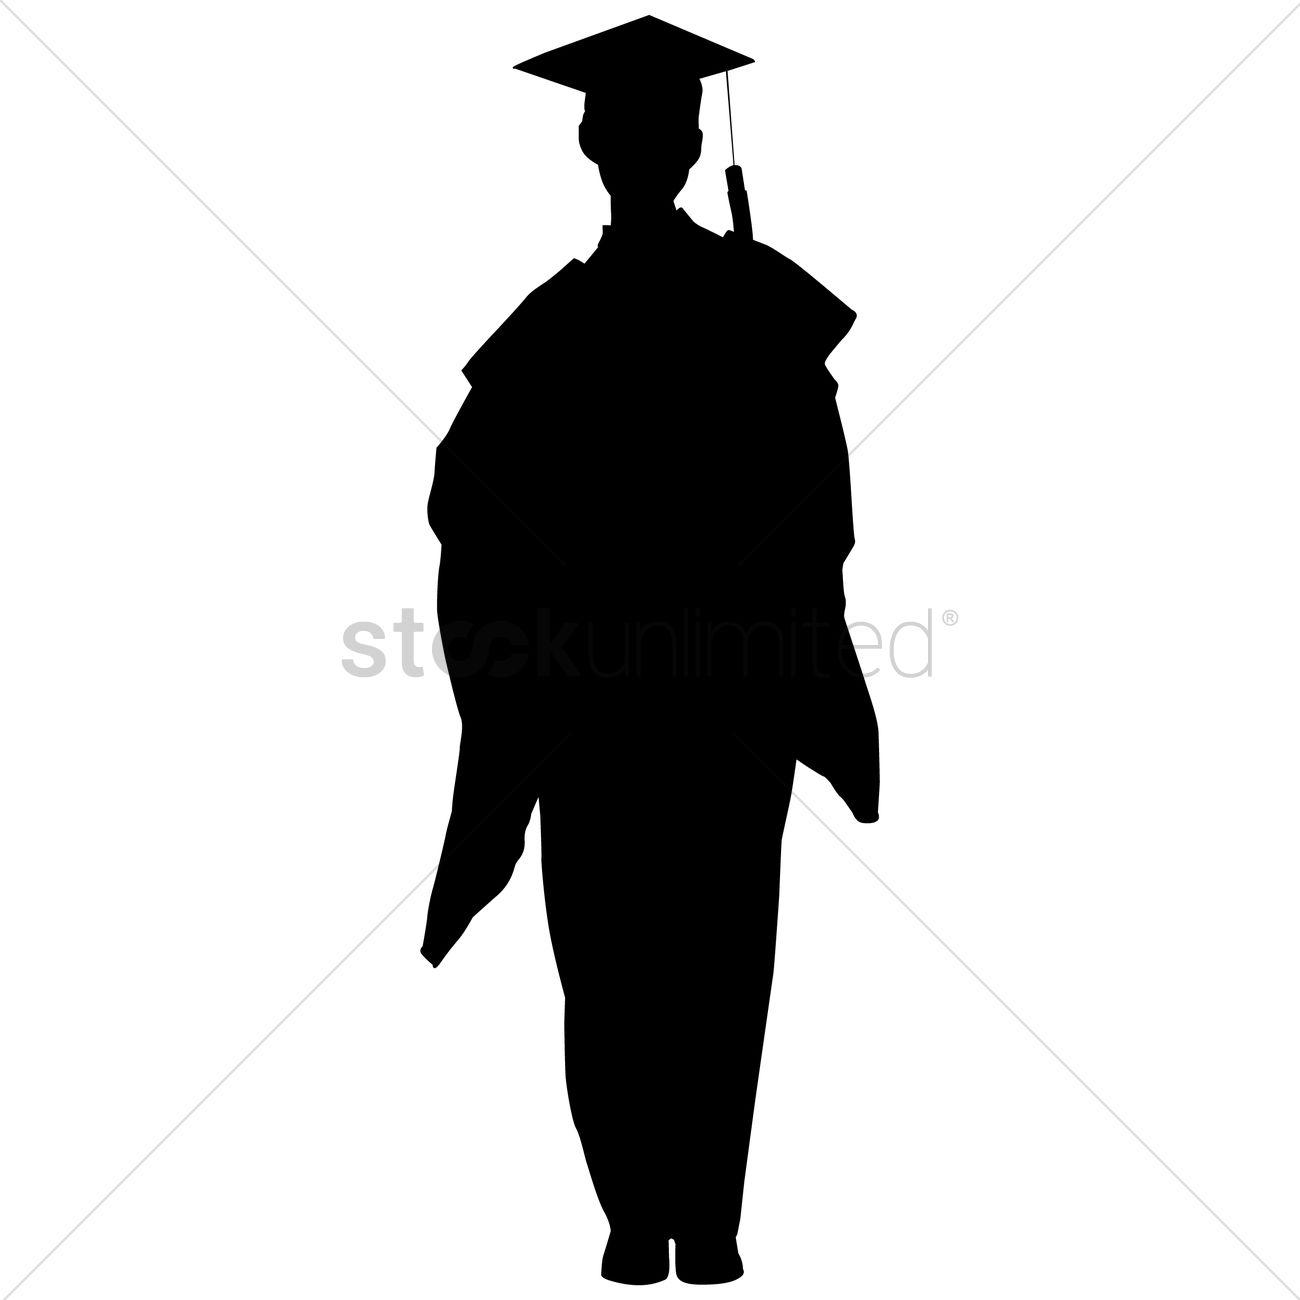 graduate silhouette vector graphic